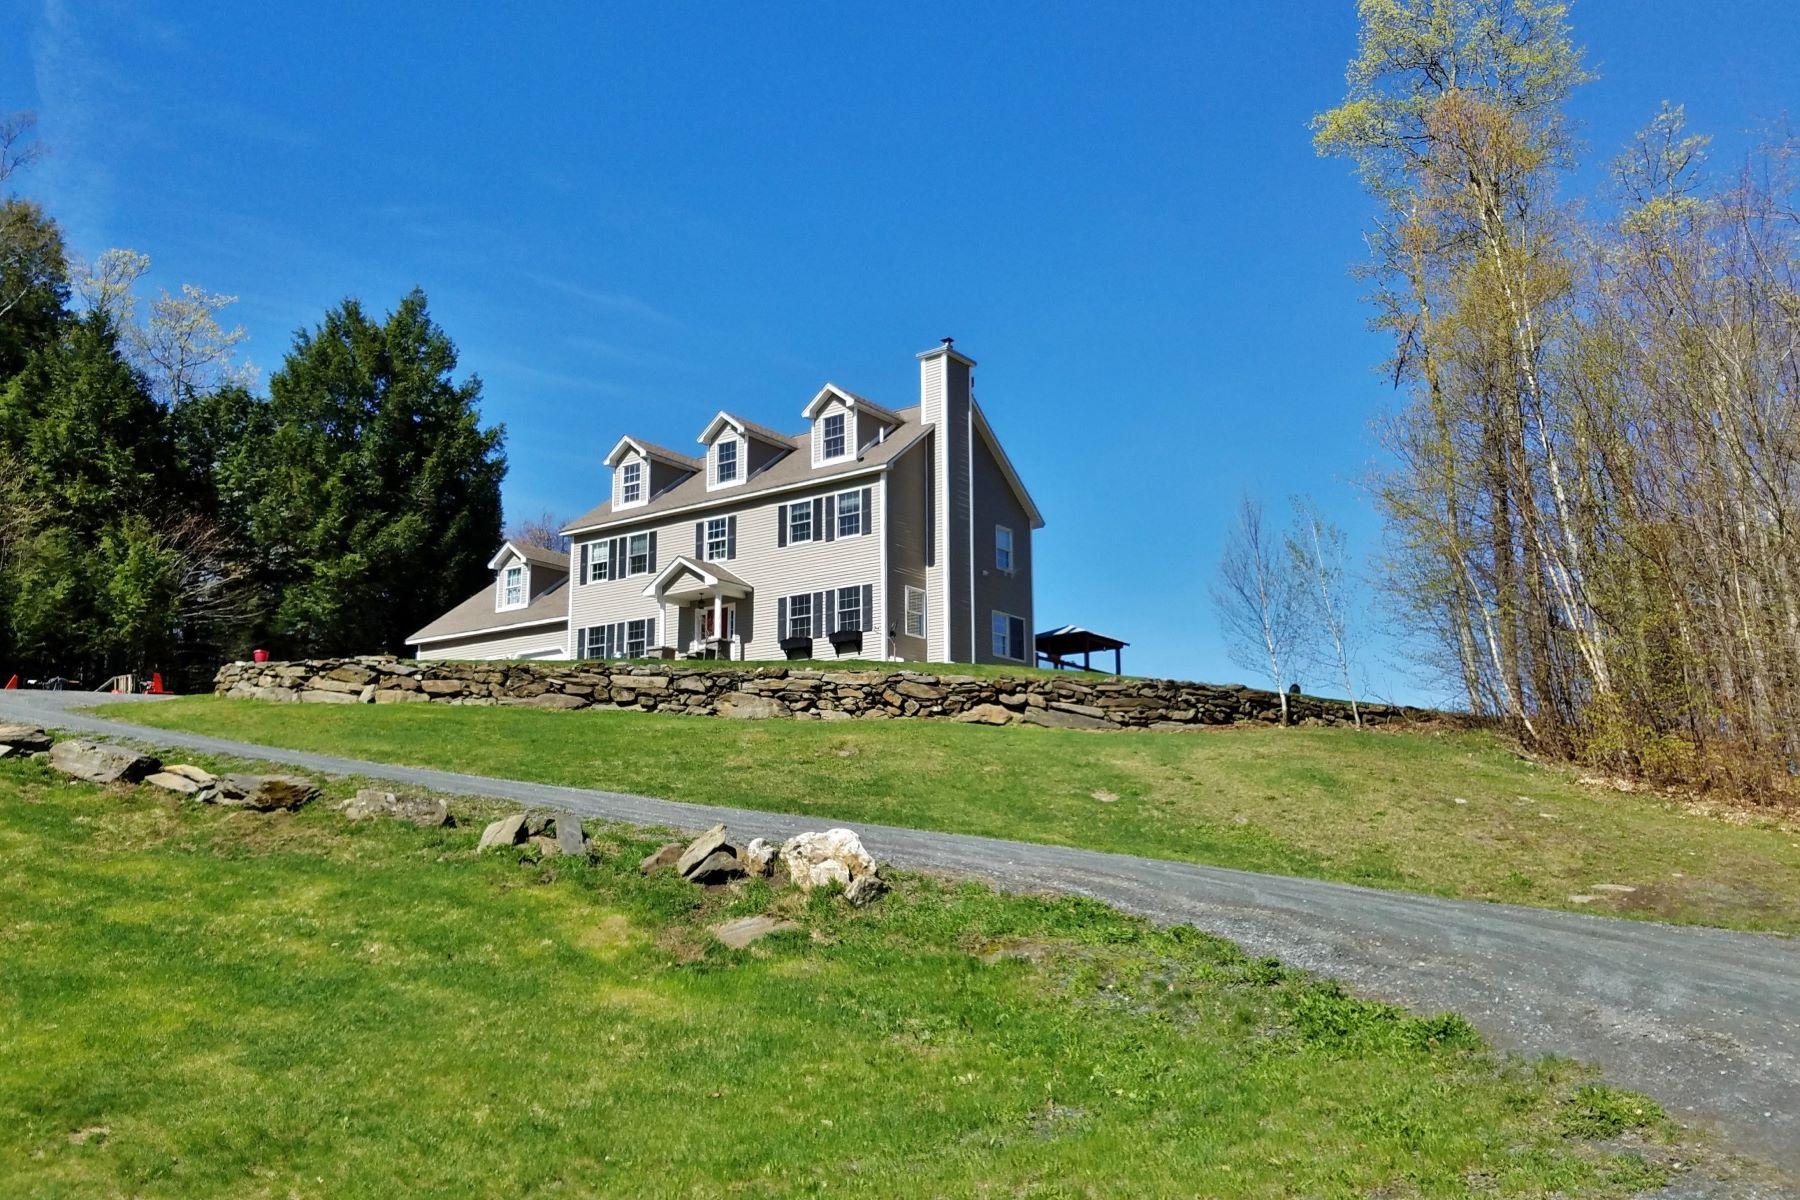 Villa per Vendita alle ore Five bedrooms, 10 acres, long range views 22 Gee Hill Rd Tunbridge, Vermont, 05077 Stati Uniti